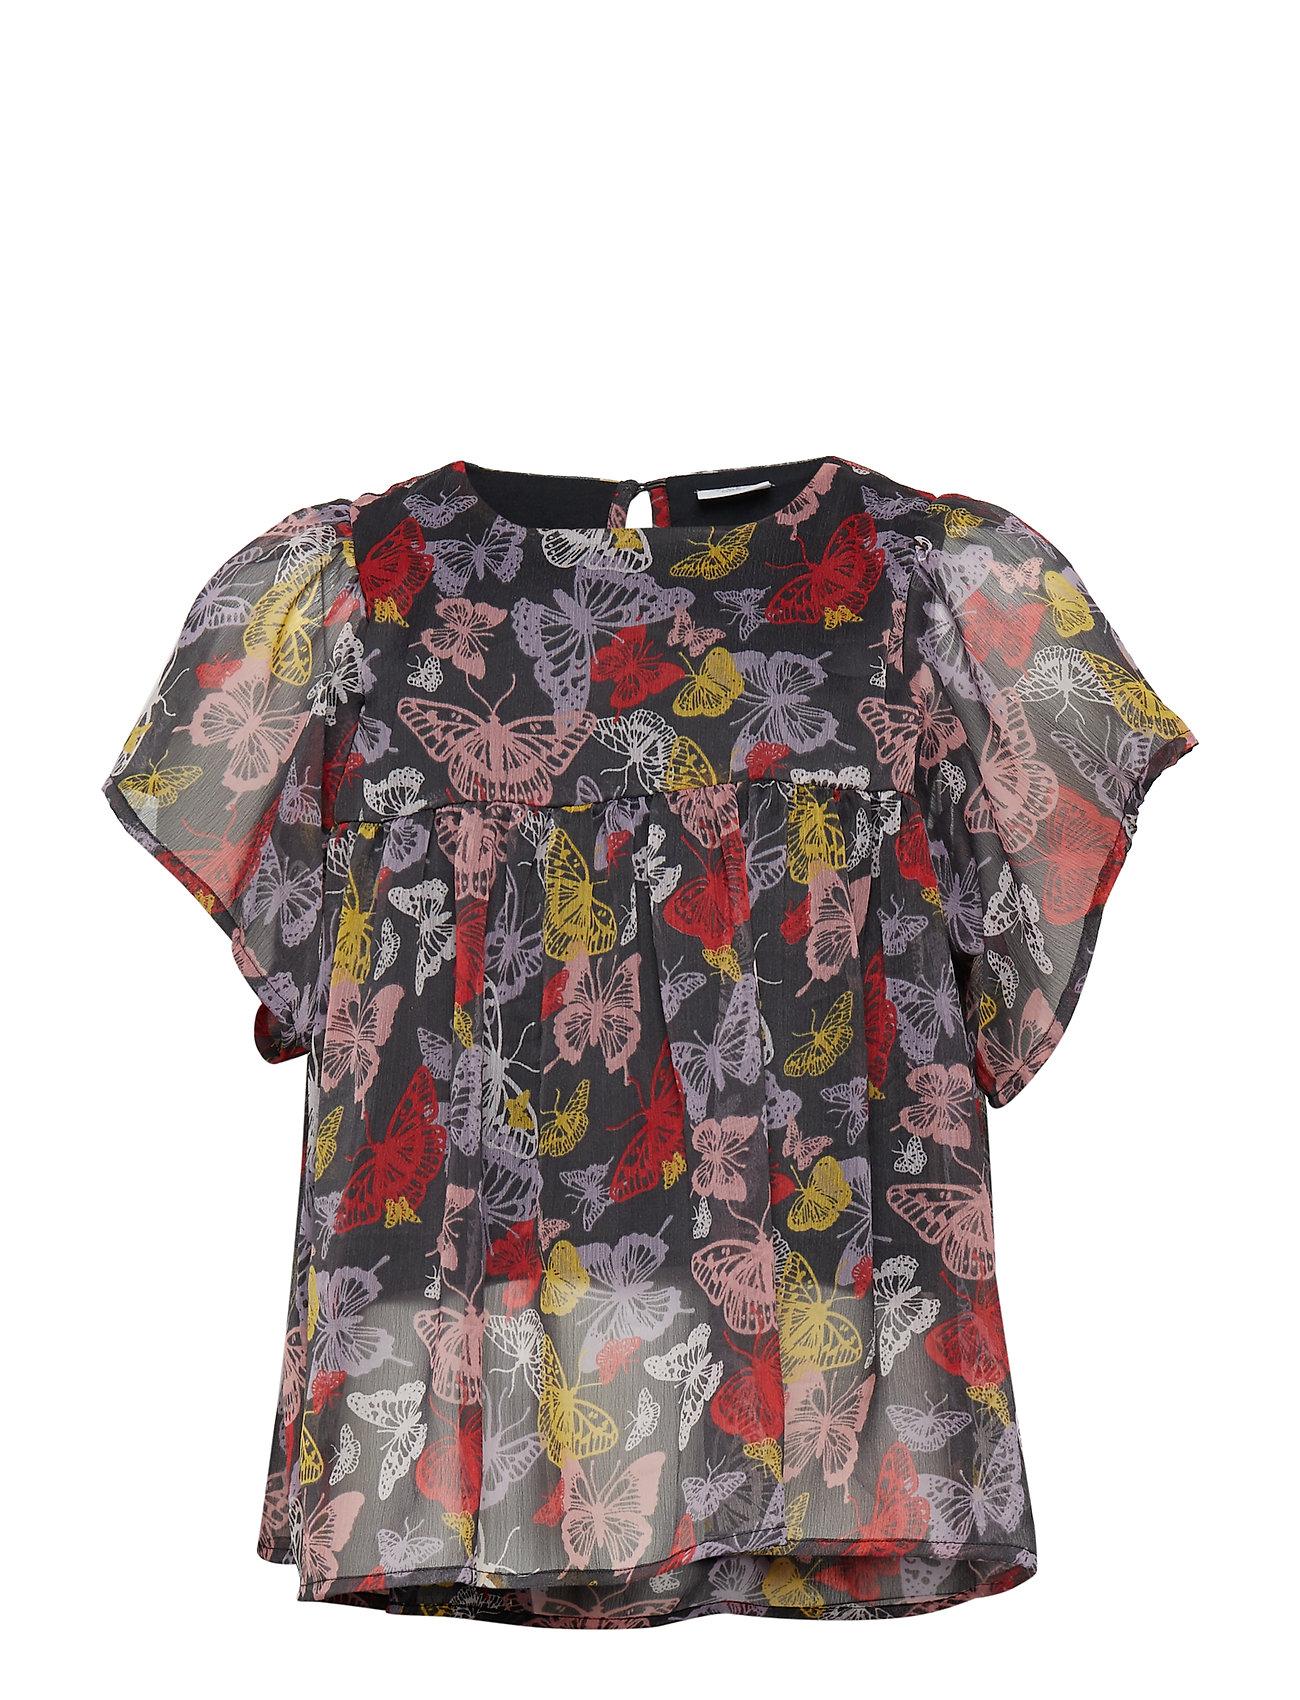 Hust & Claire Rosamarie - Shirt - MAGNET